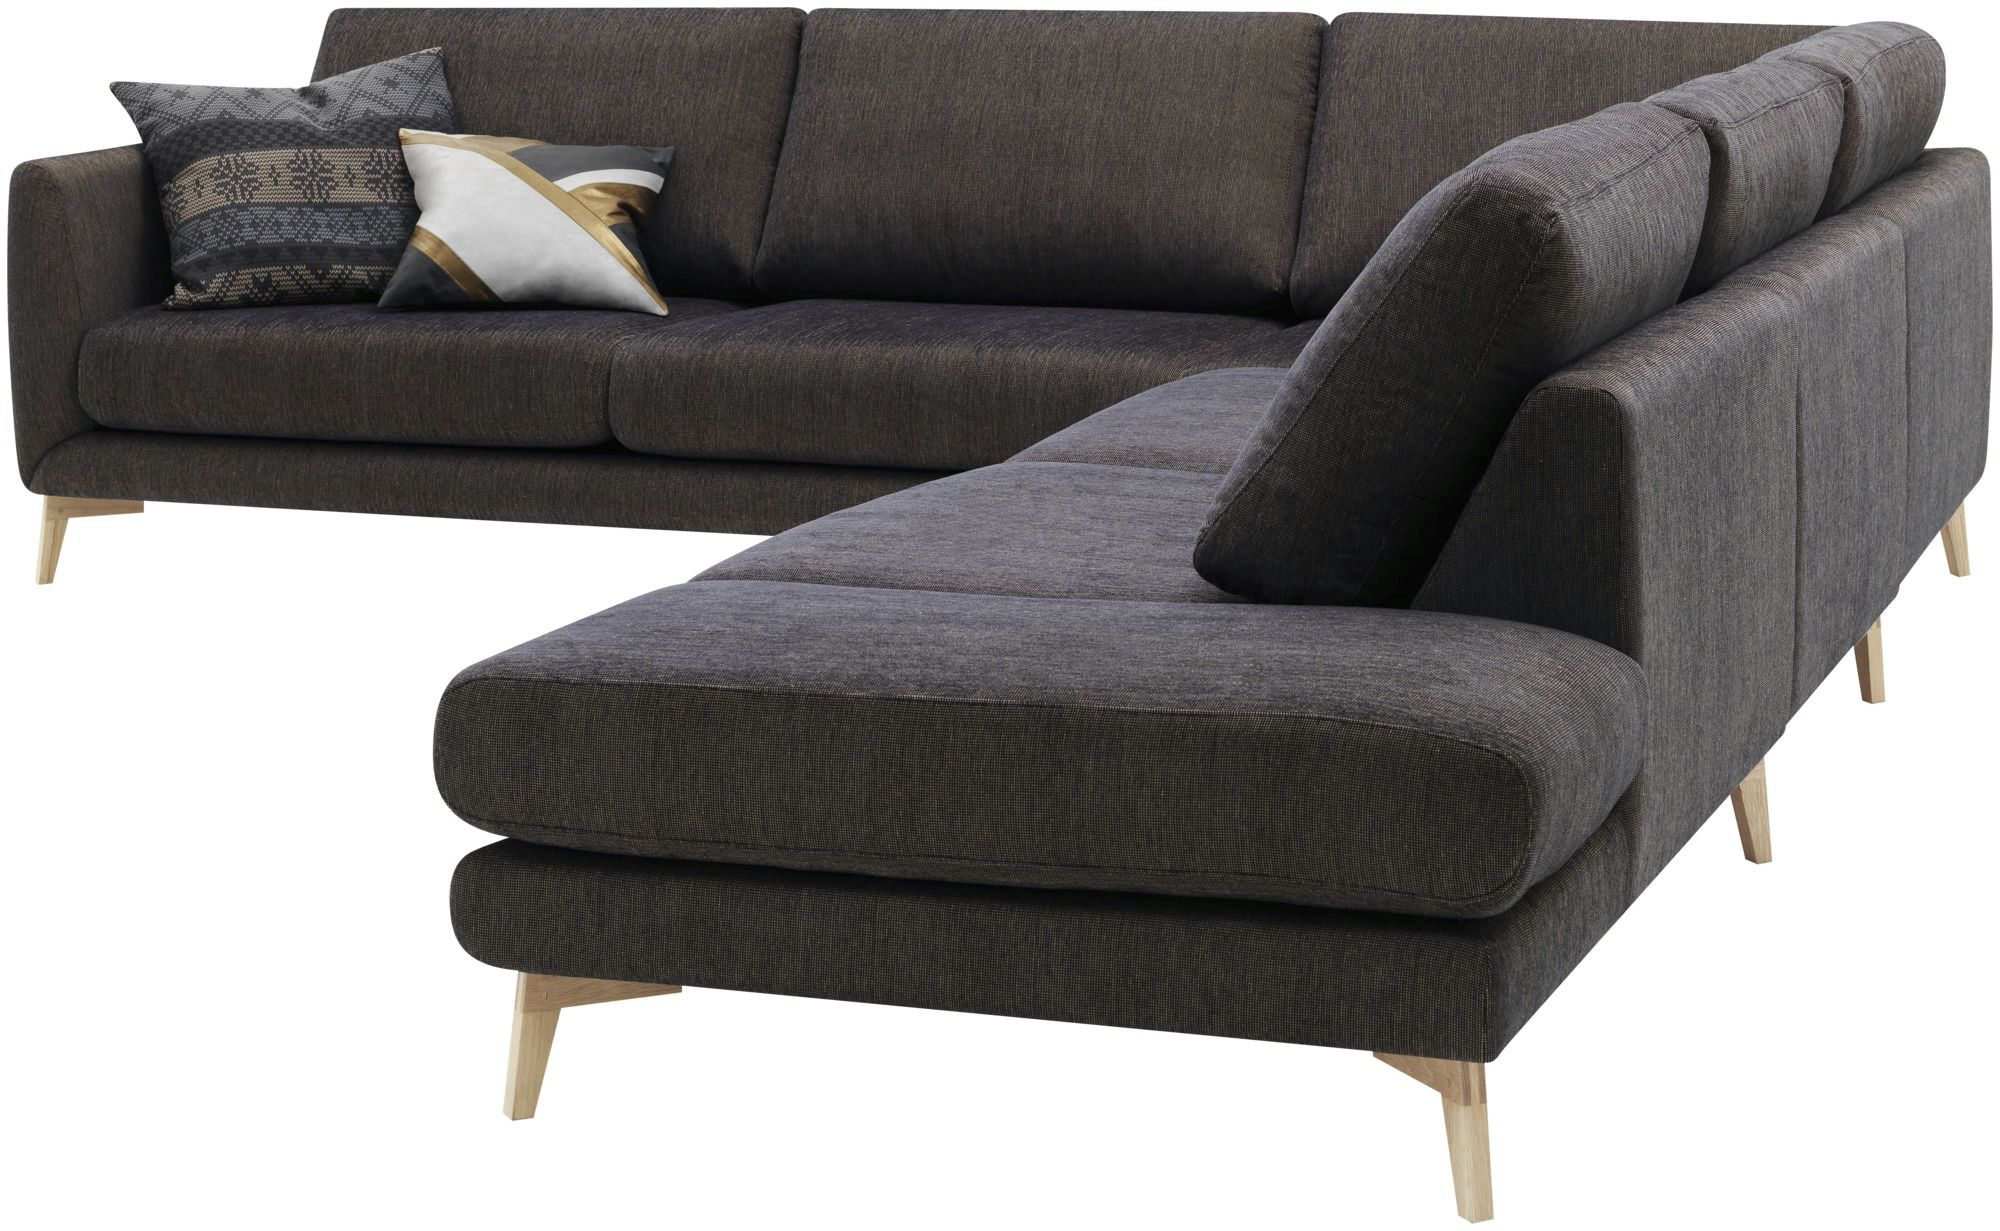 ... Corner Sofa / Modular / Contemporary / Leather FARGO By Anders Nørgaard  BoConcept